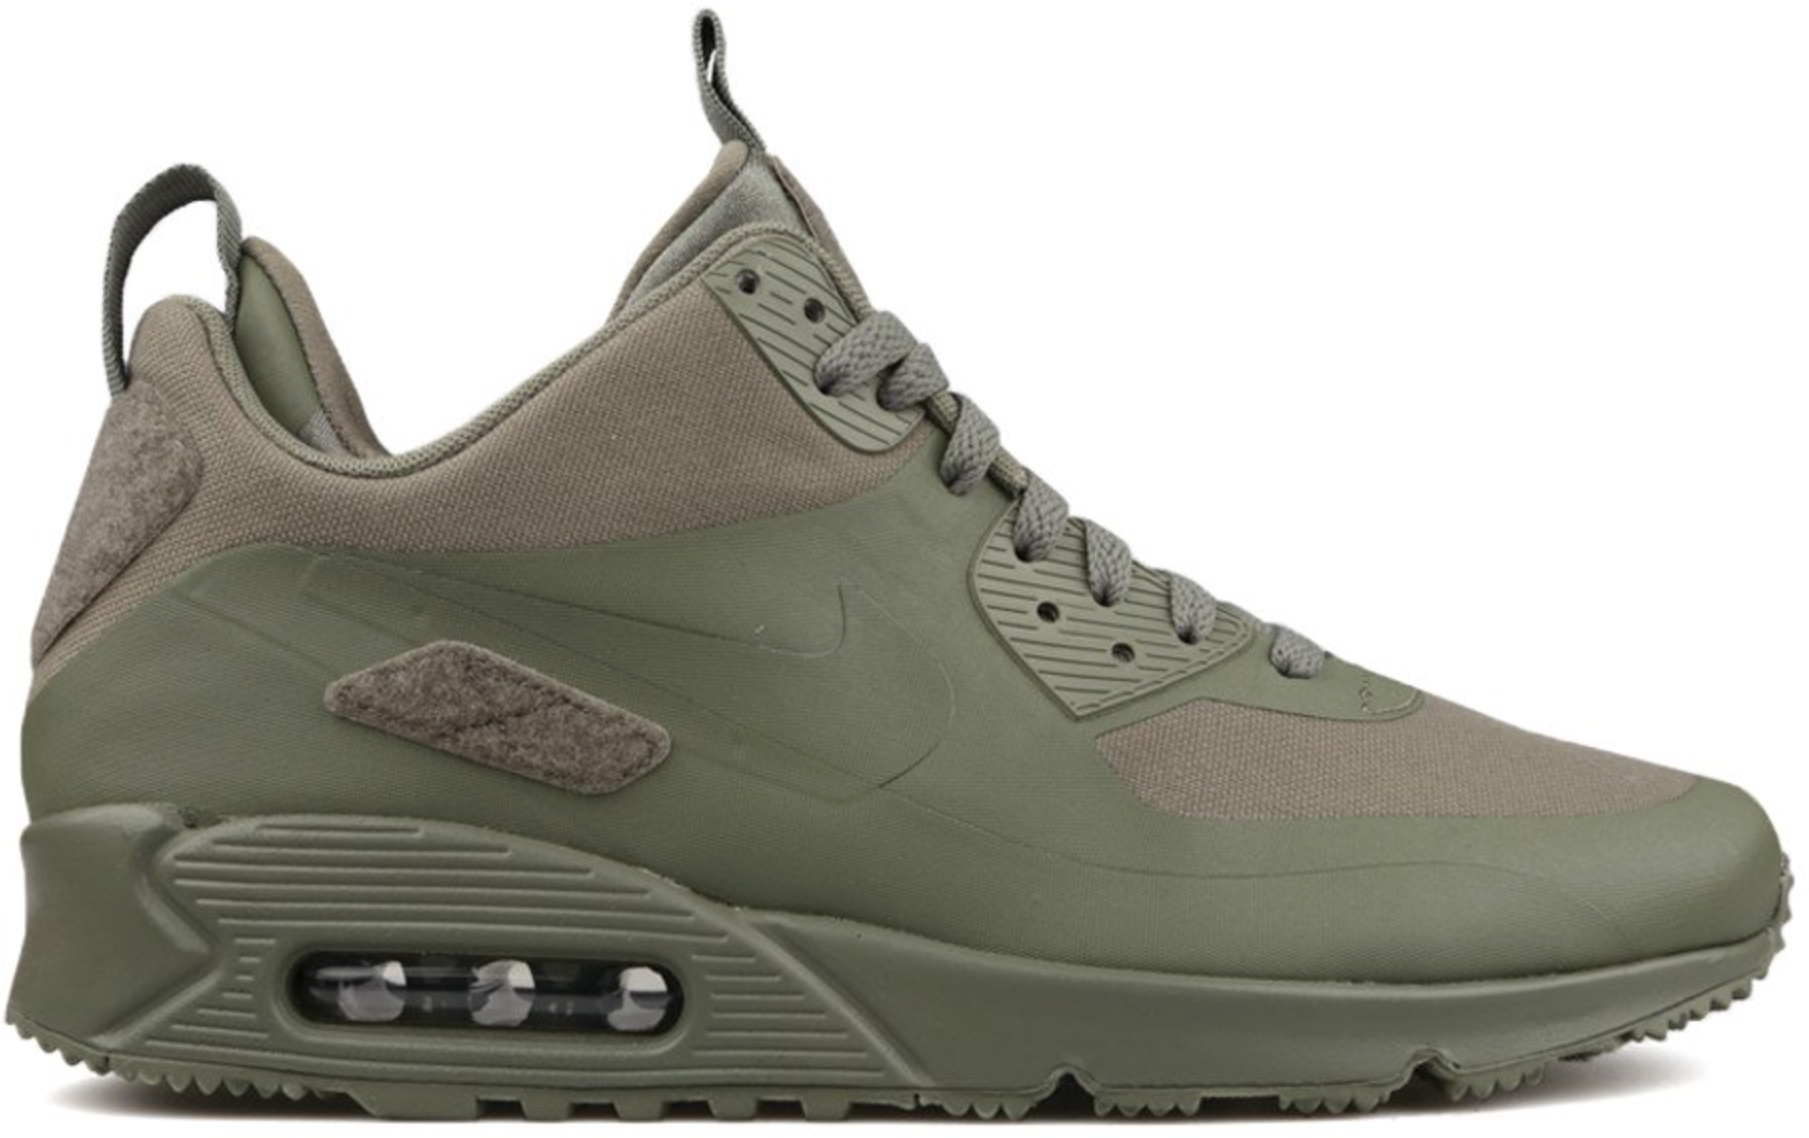 Nike Air Max 90 Essential Dark GreyVolt Black Mens Running Shoe AJ1285 015 sz 8